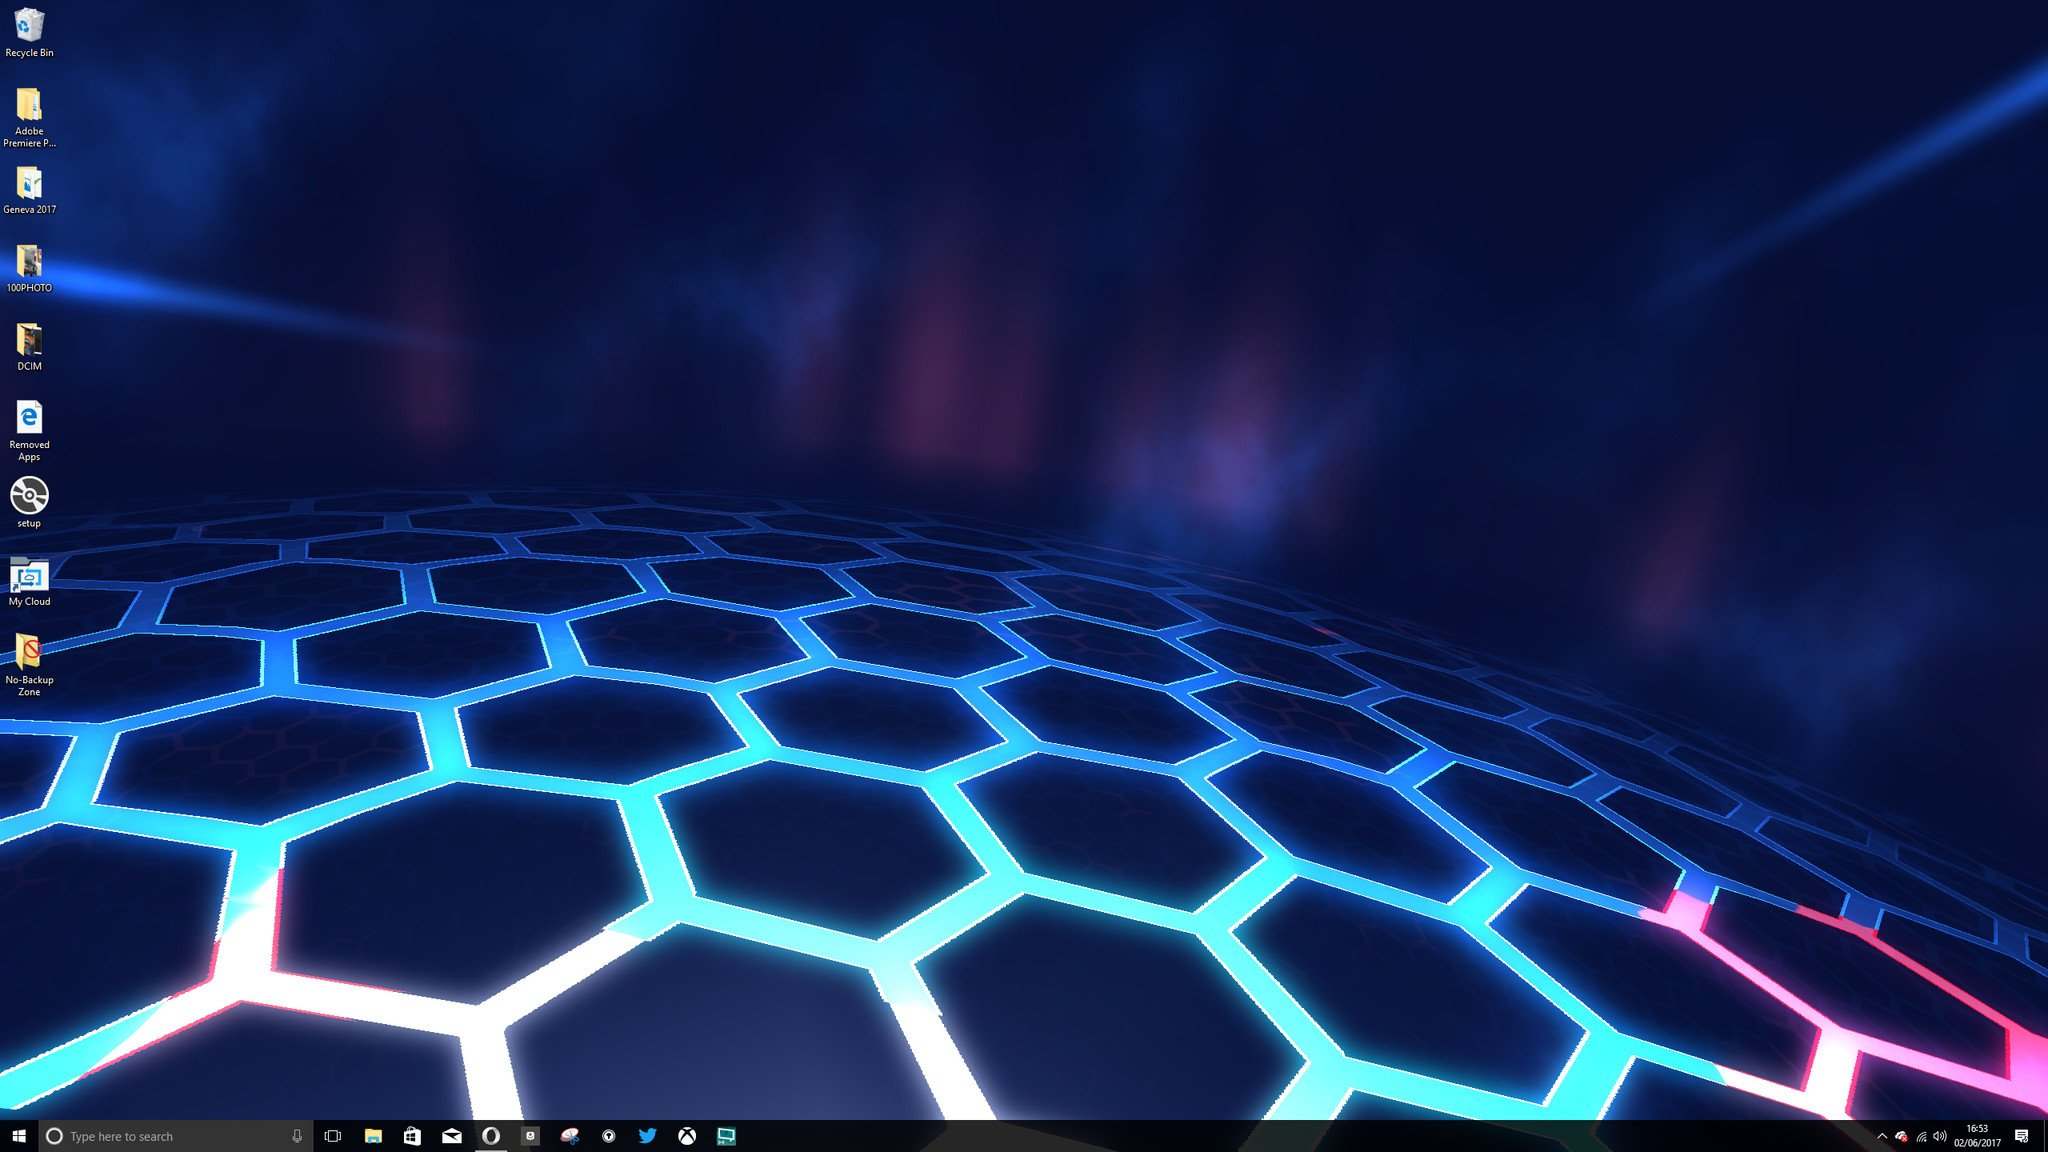 Make your Windows desktop move with Wallpaper Engine - F3News